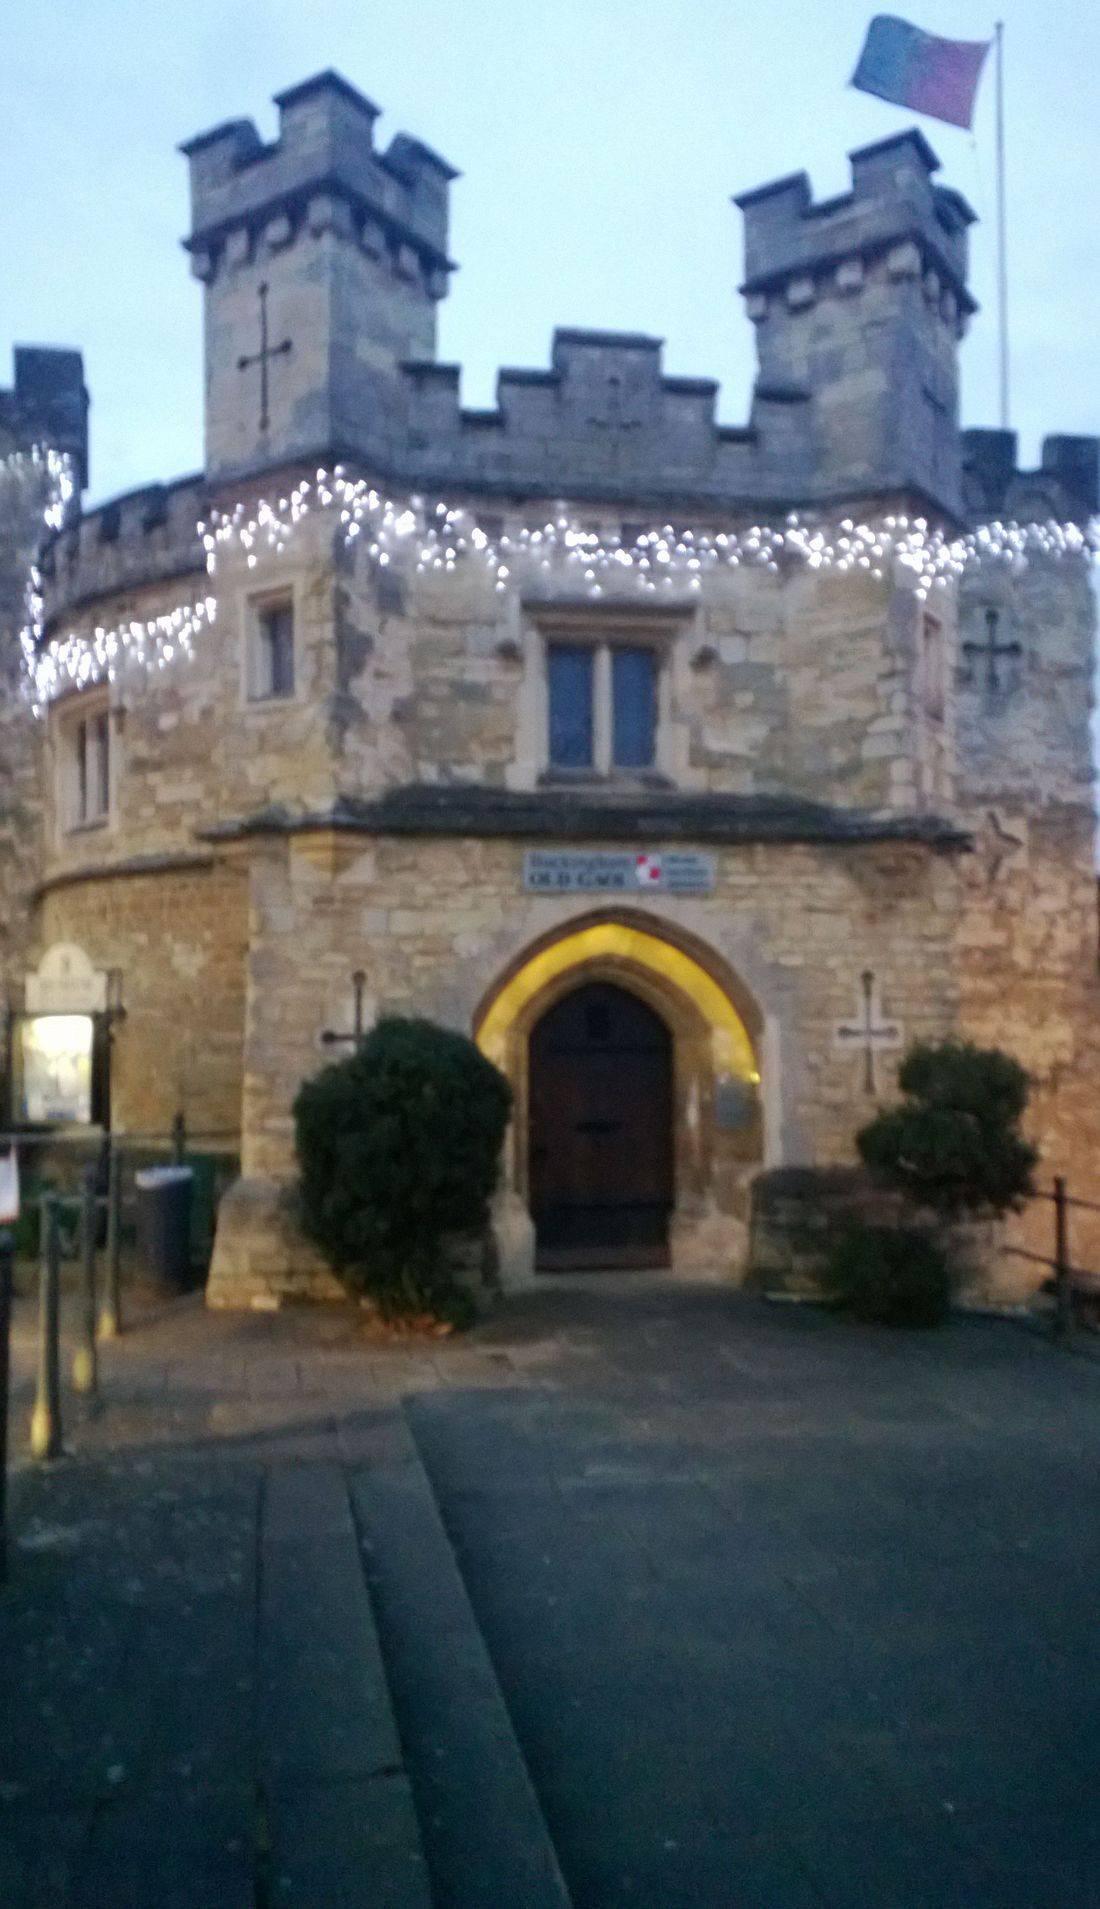 Buckingham Gaol Courier Service